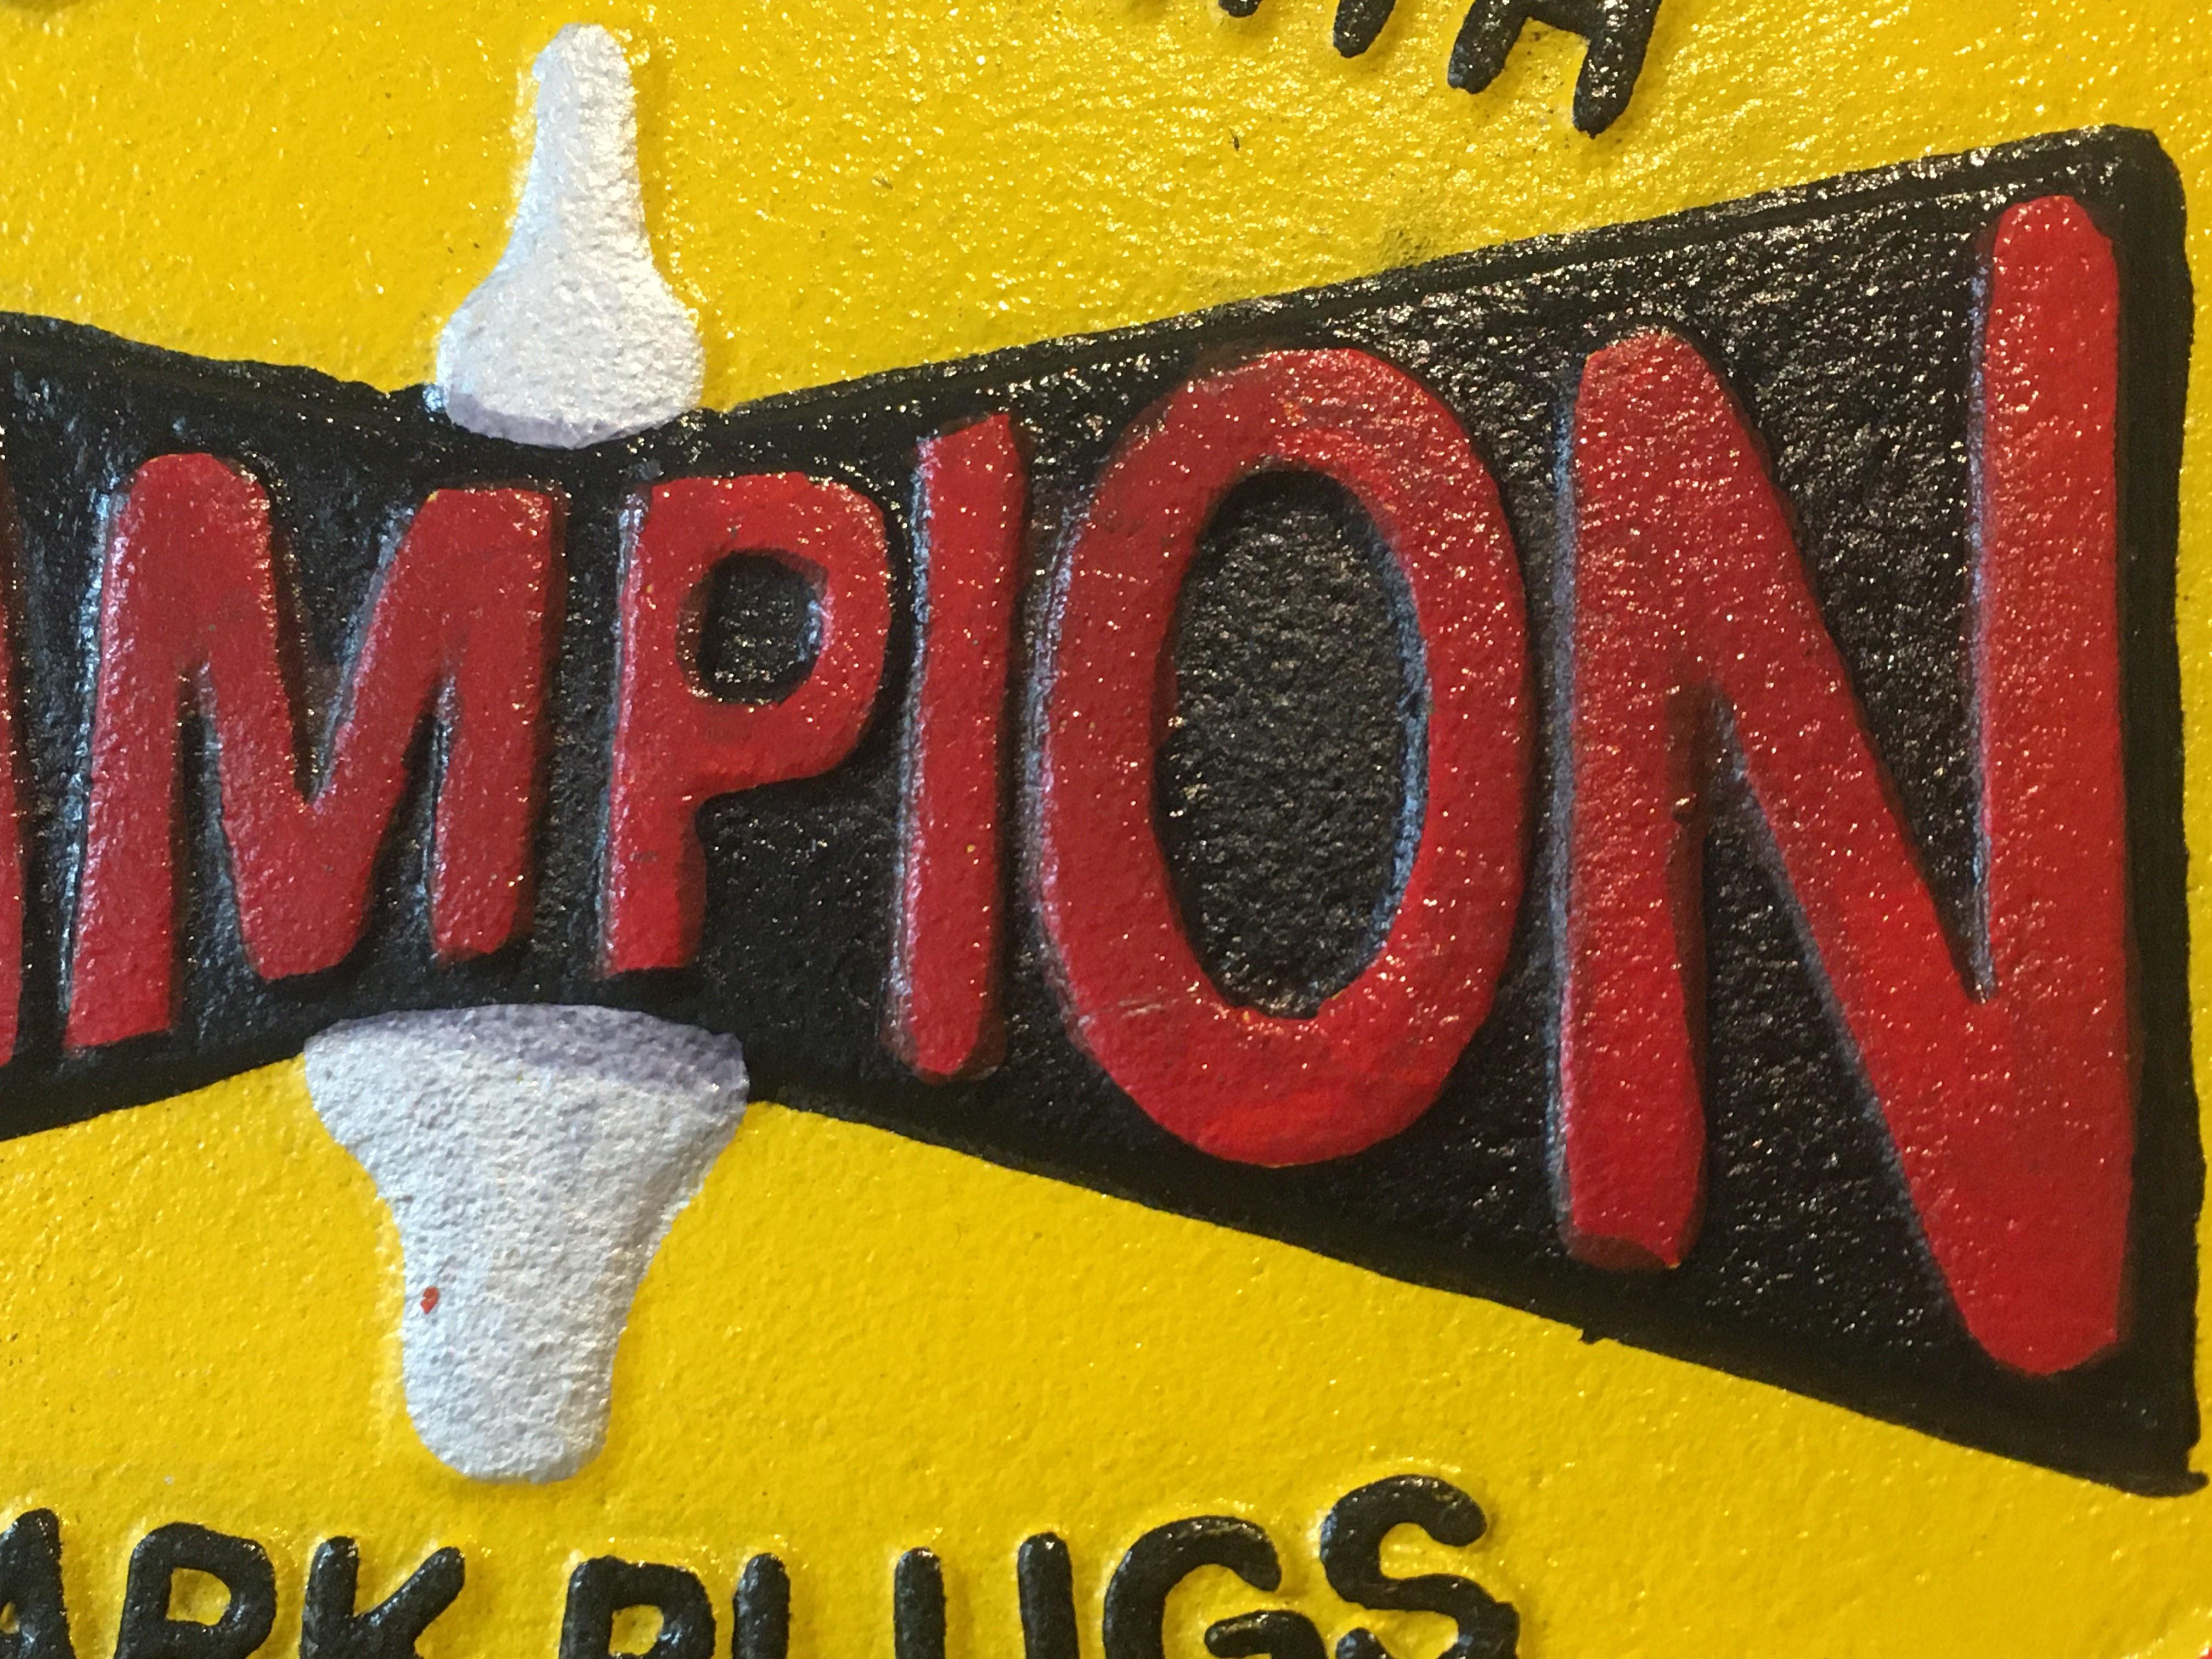 Champion 'Spark Plugs' Cast Iron Sign - Image 6 of 6